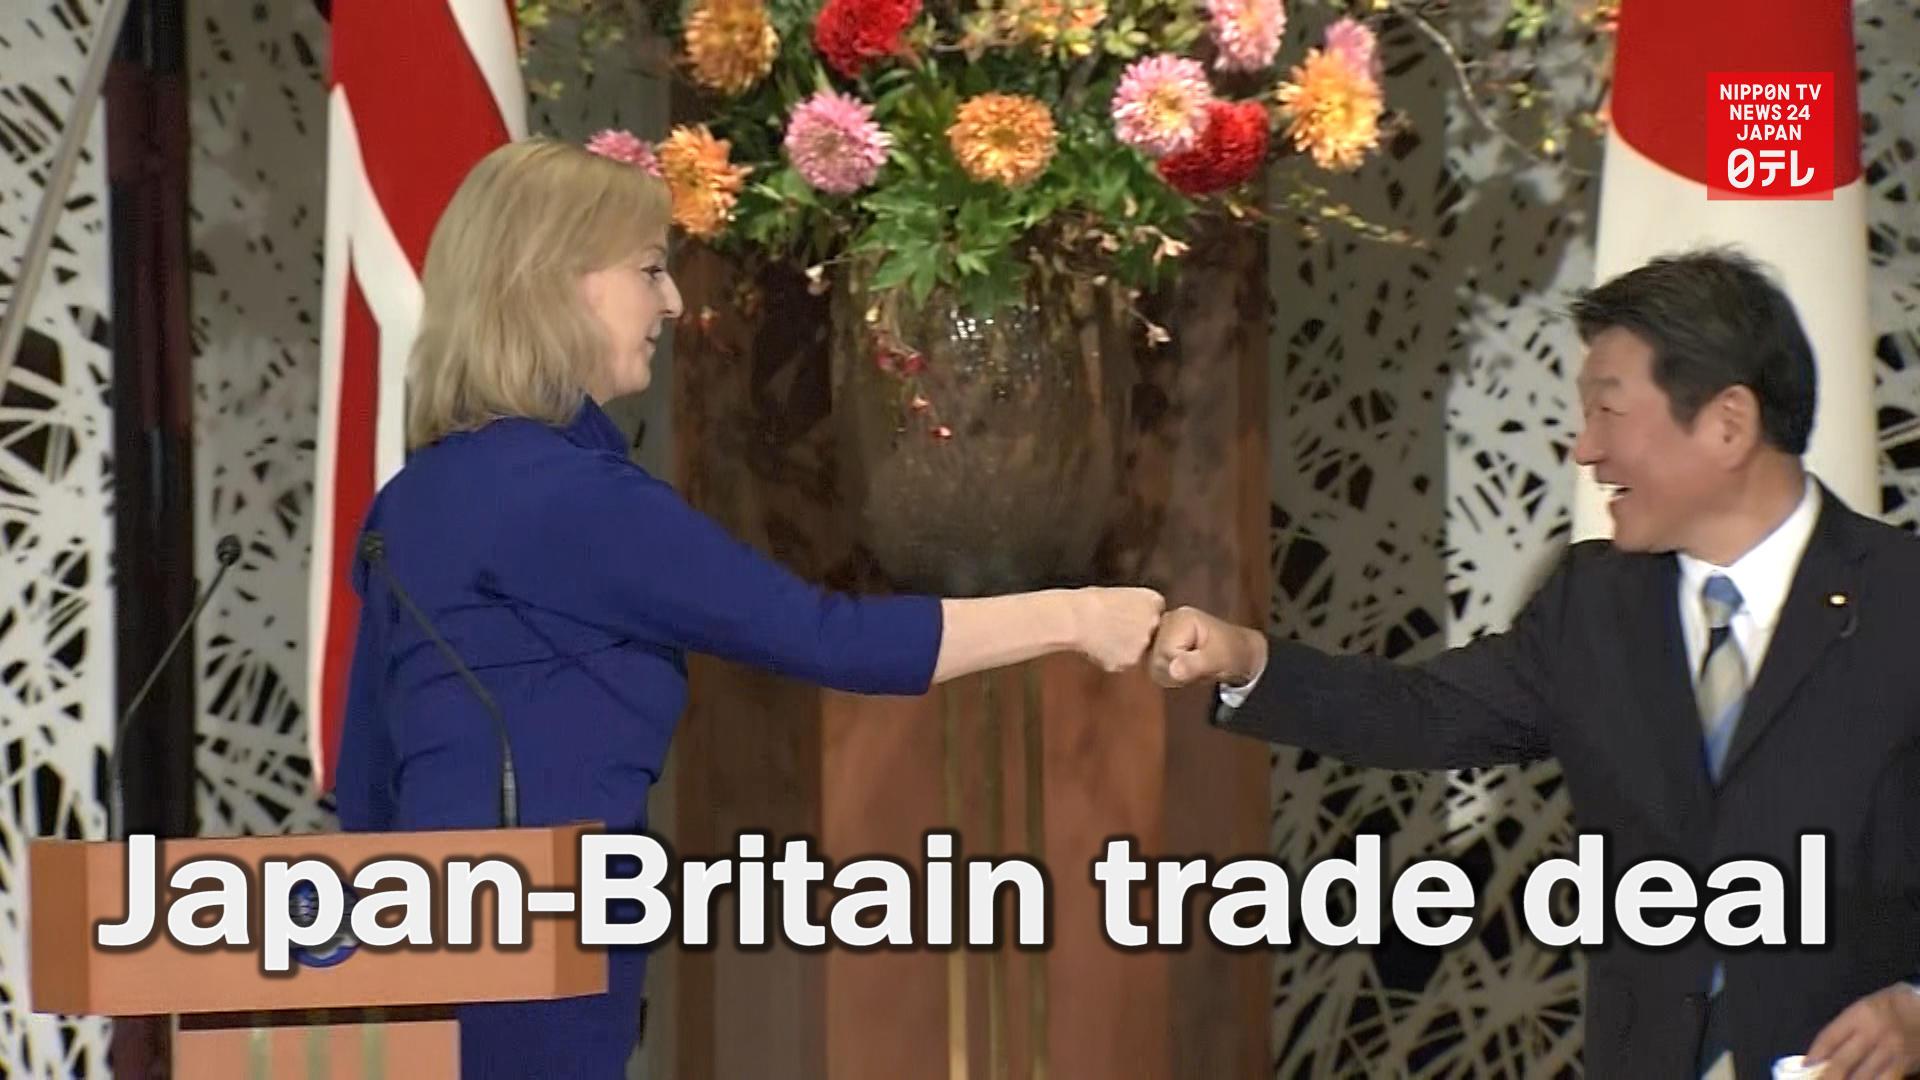 Japan, Britain sign trade deal